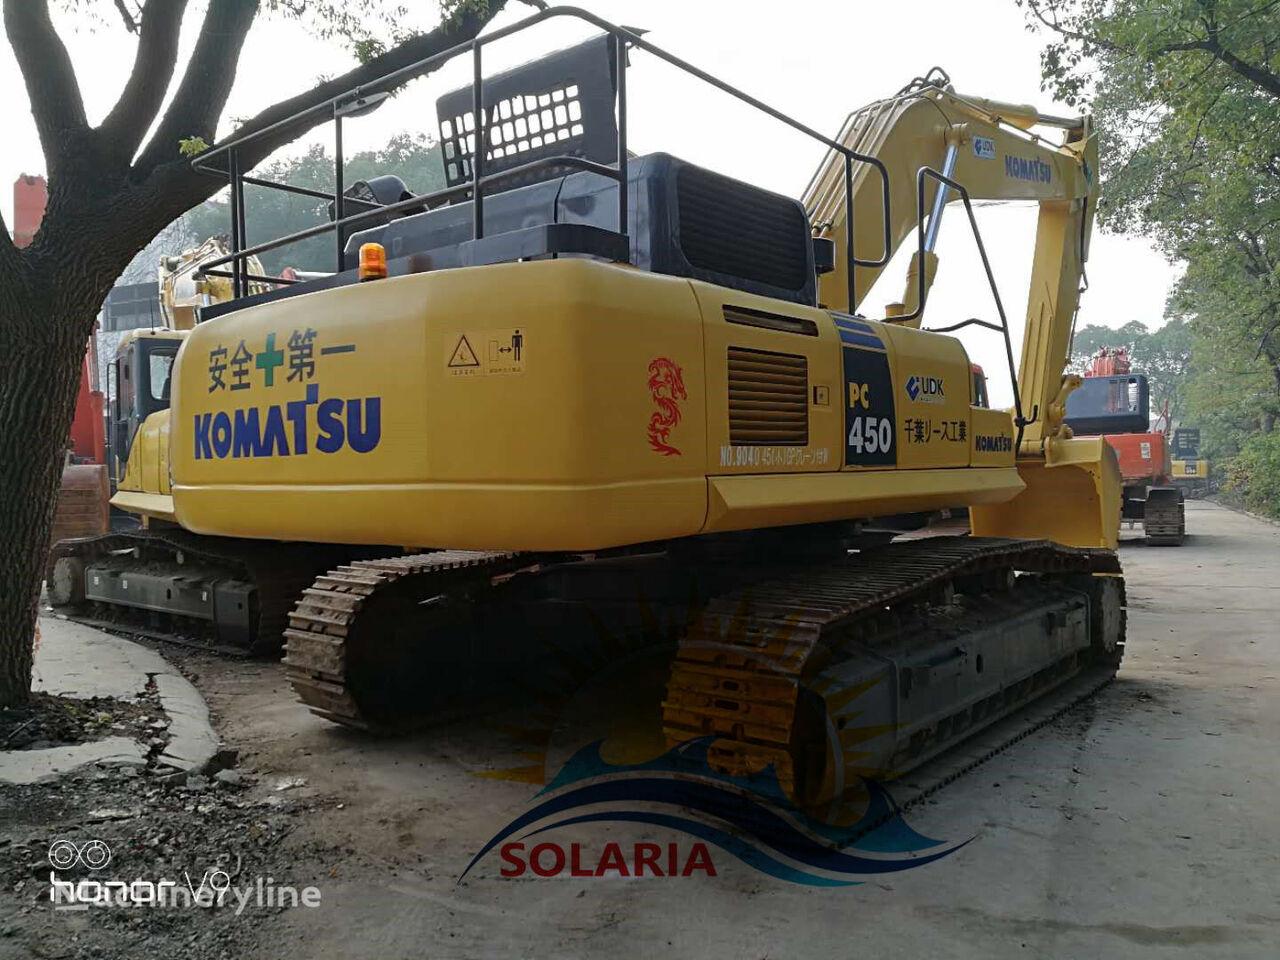 KOMATSU PC450-8 excavadora de orugas